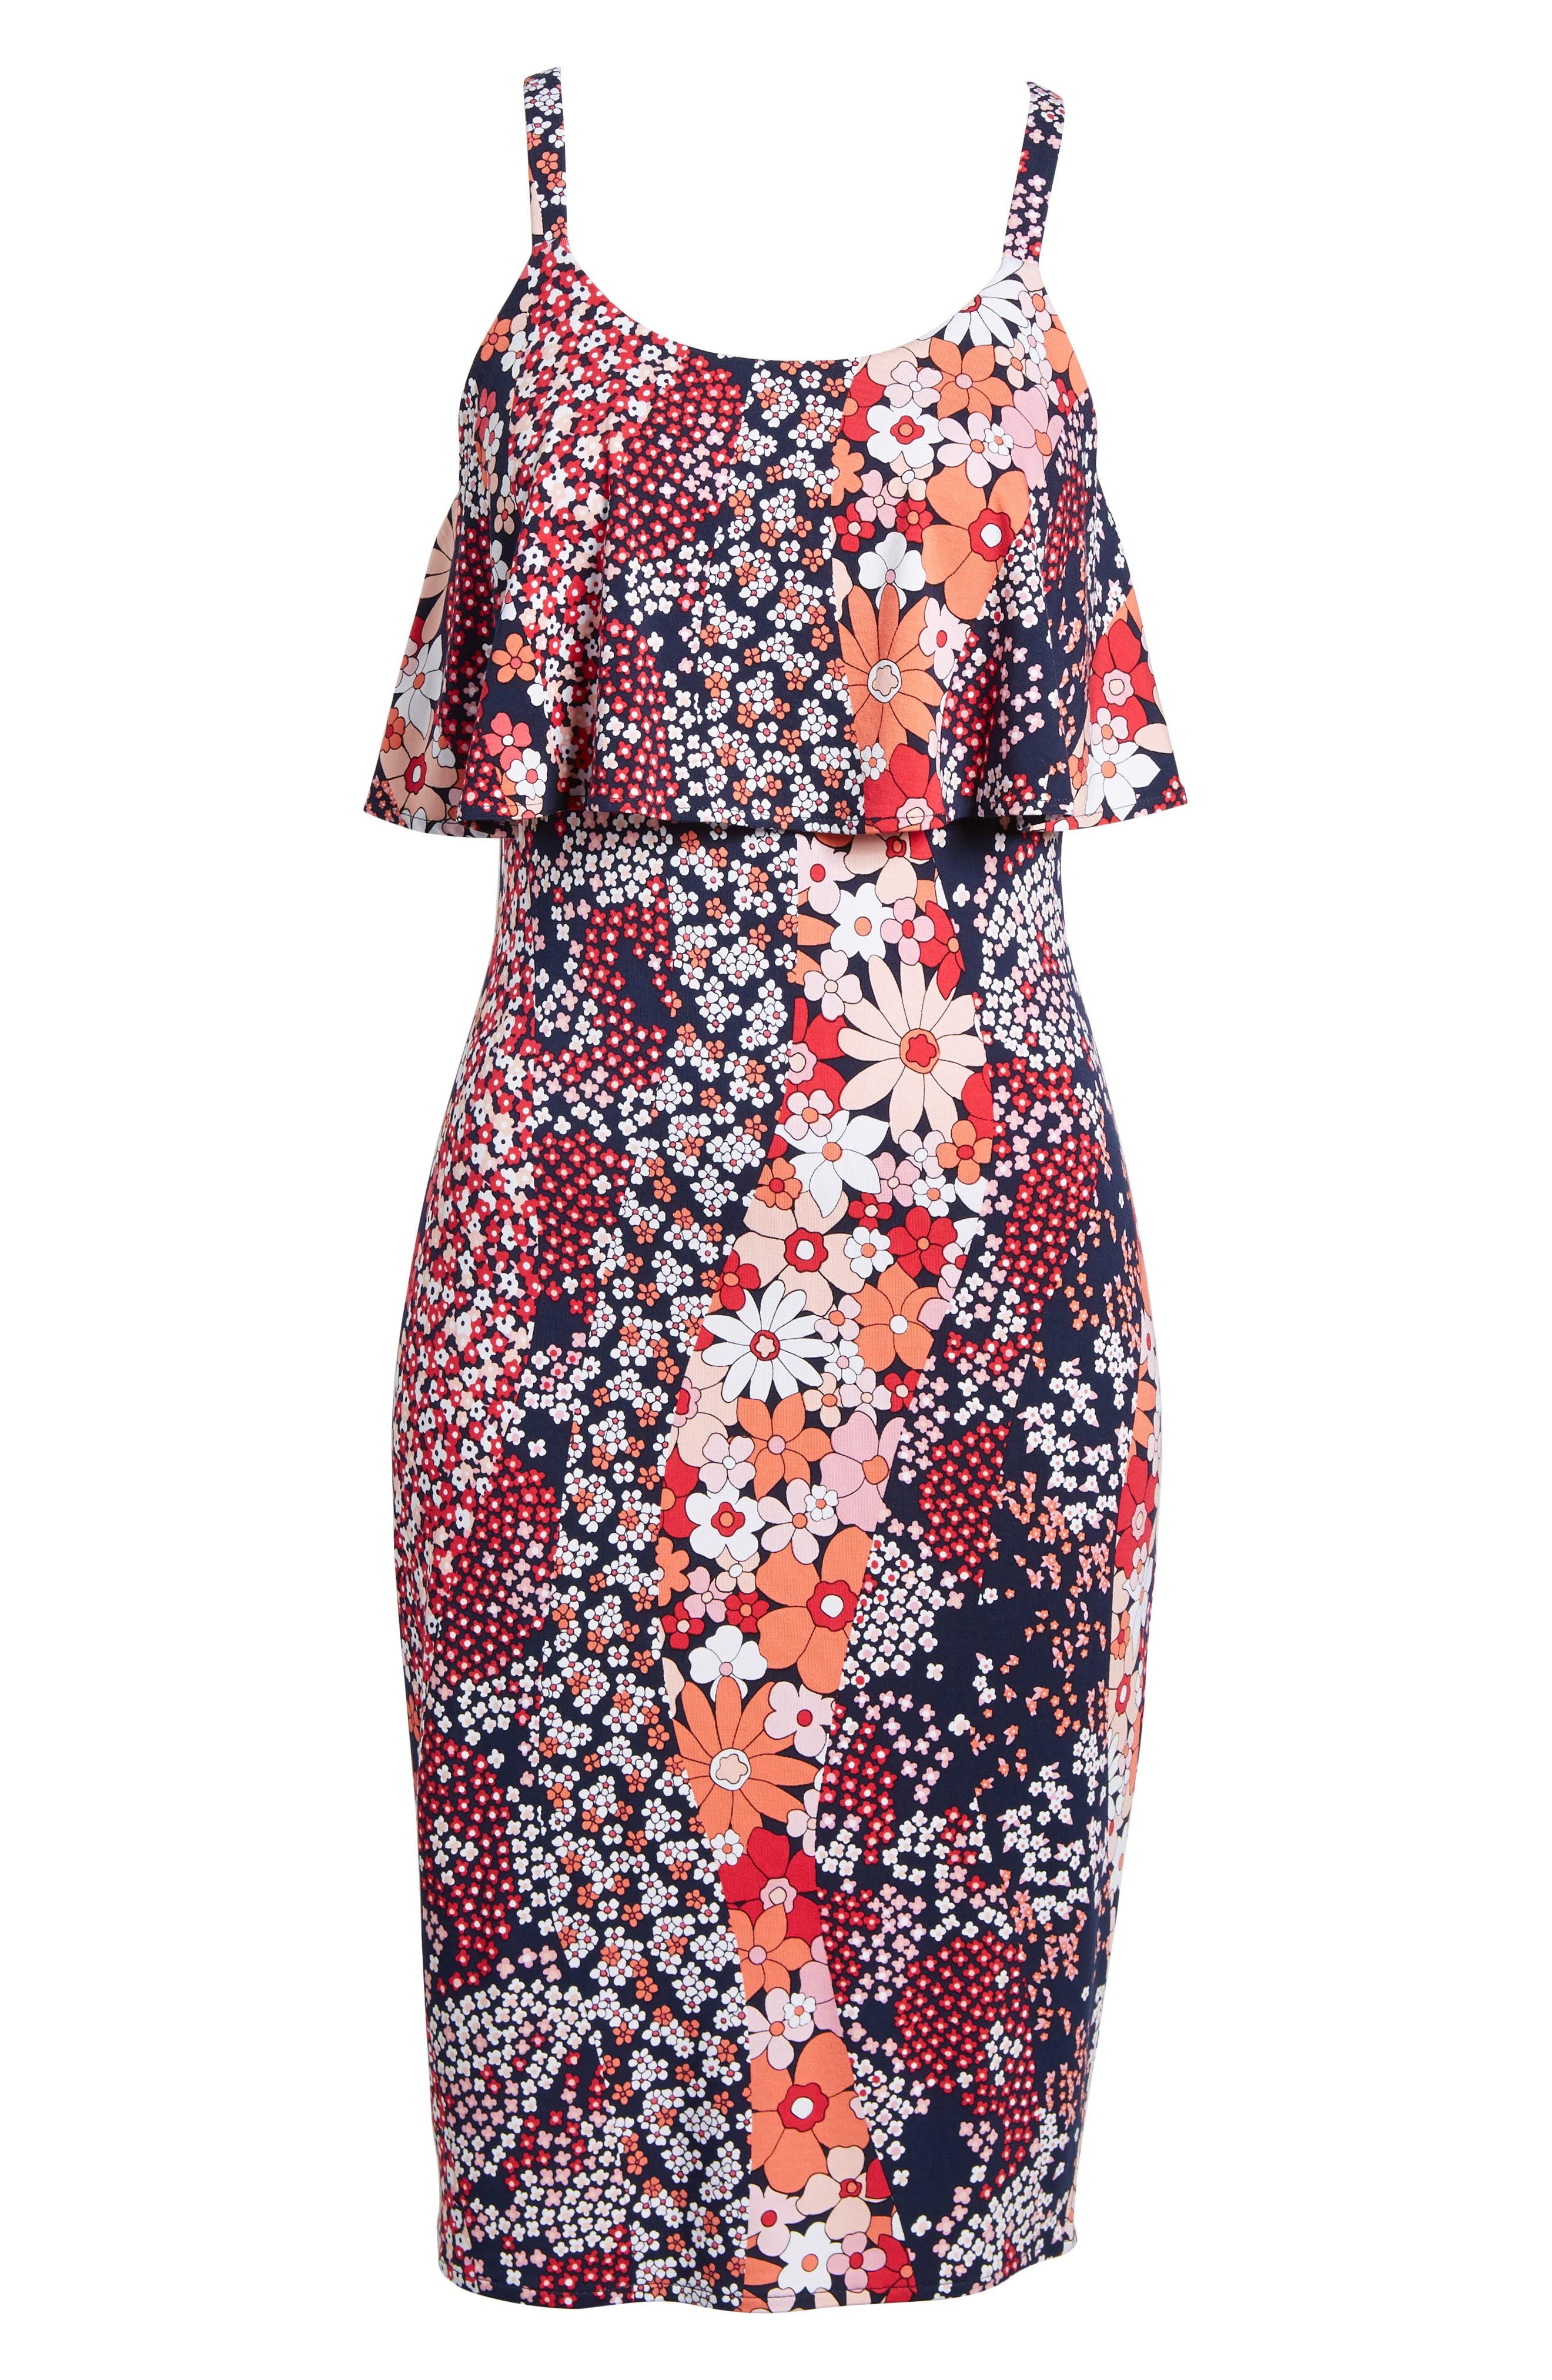 Print Floral Dress,                             Alternate thumbnail 6, color,